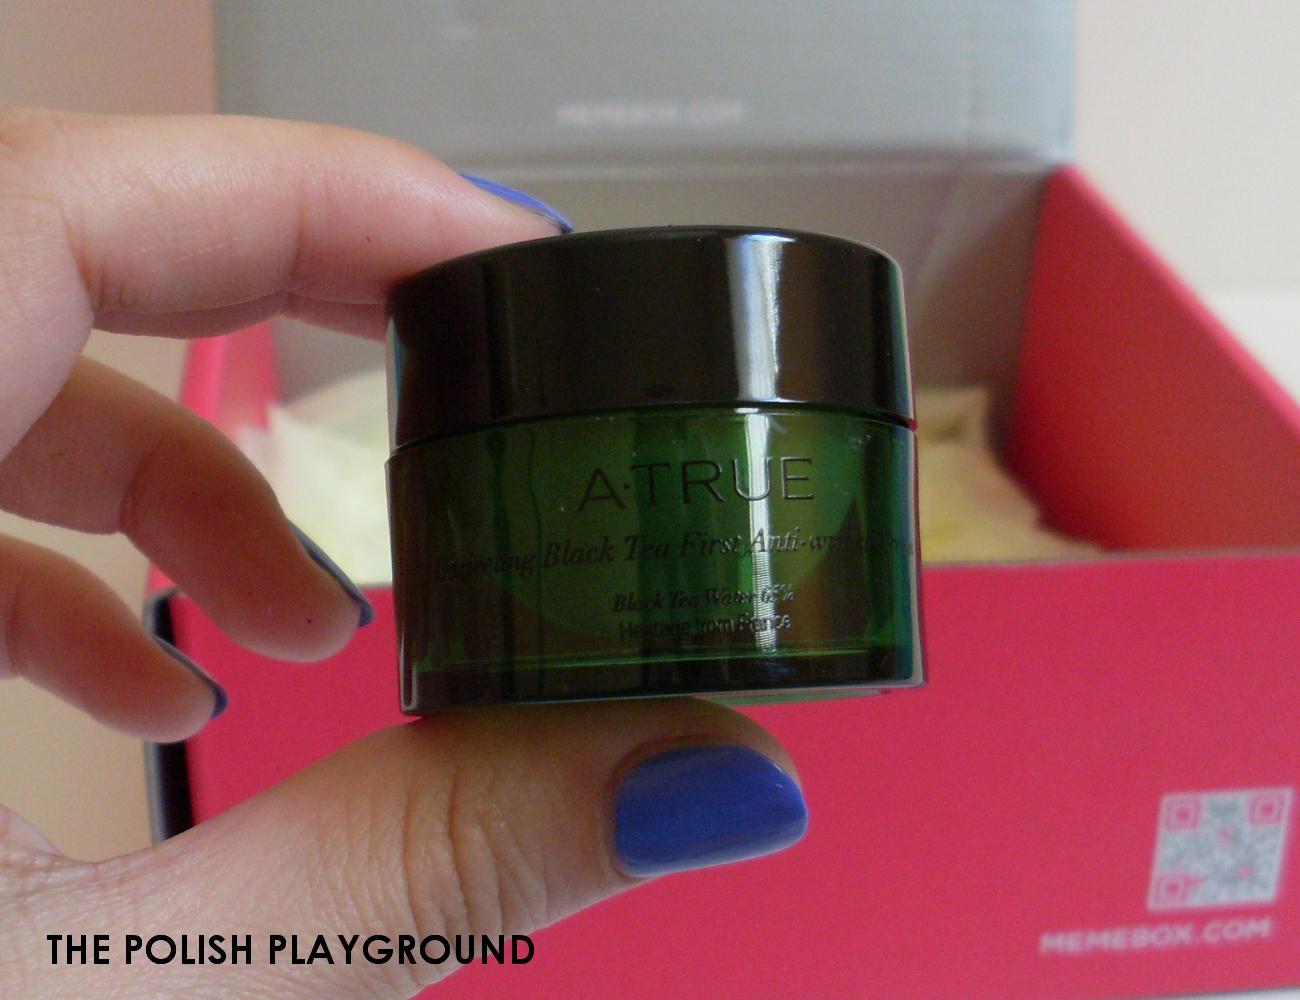 Memebox Minibox #3 Unboxing - A. True Dargeeling First Anti-Wrinkle Cream